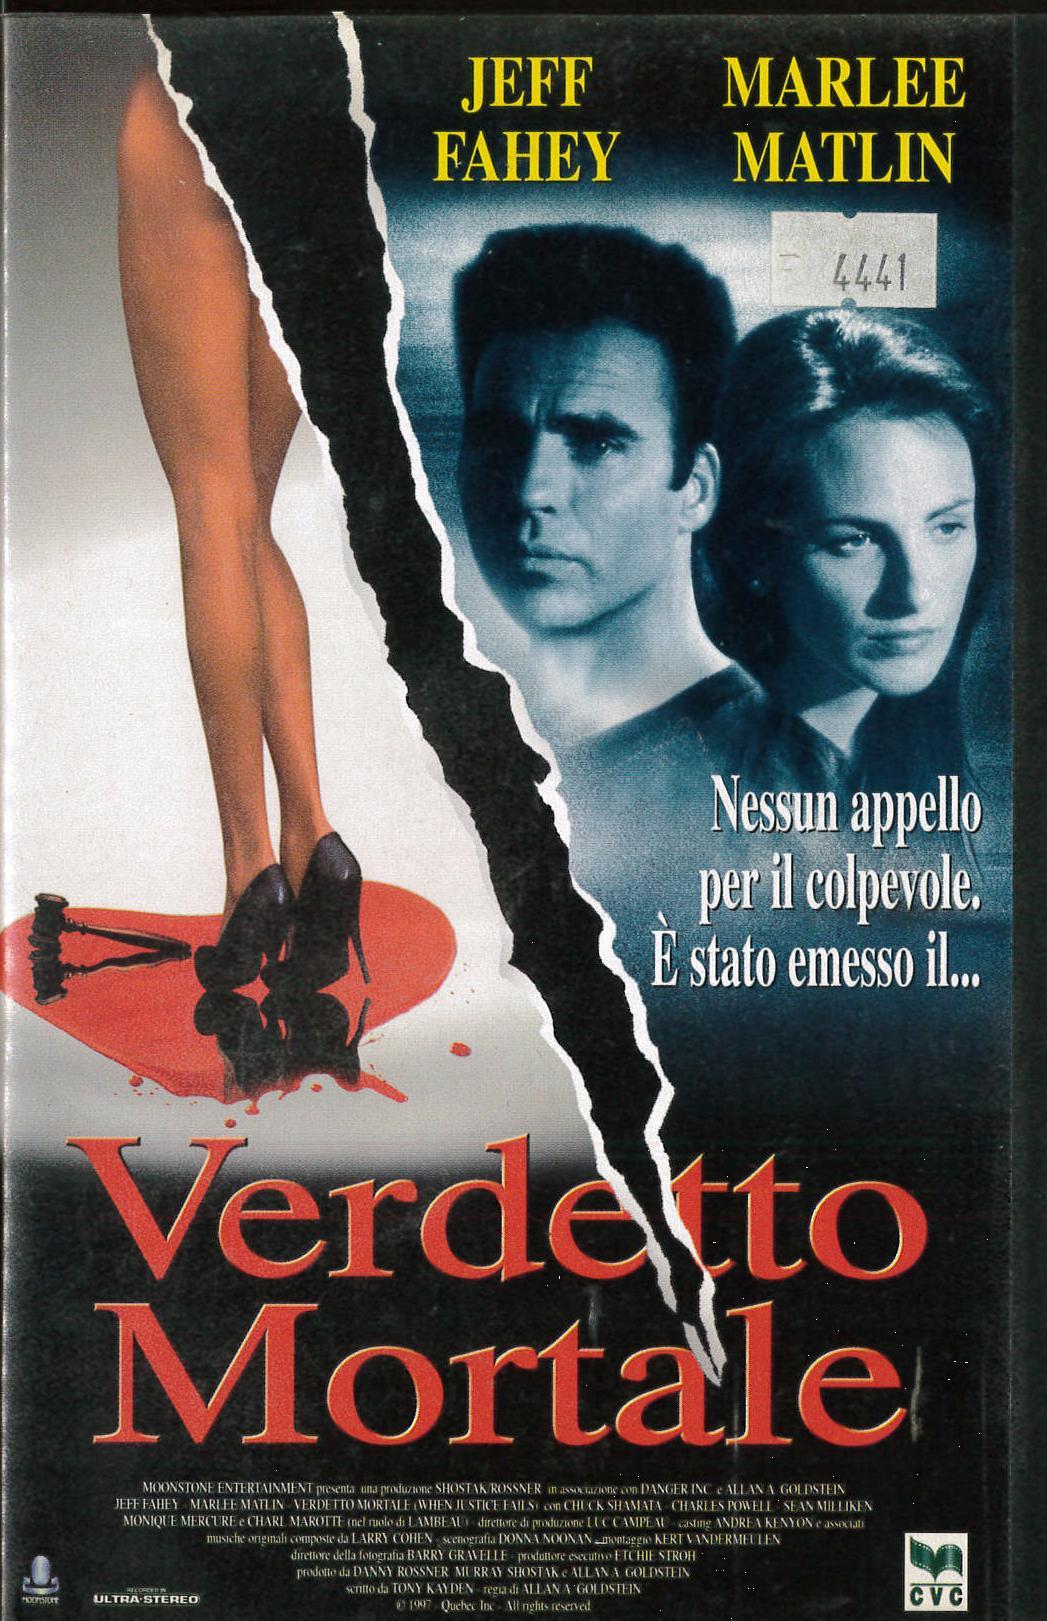 VERDETTO MORTALE - VHS EX NOLEGGIO (VHS)